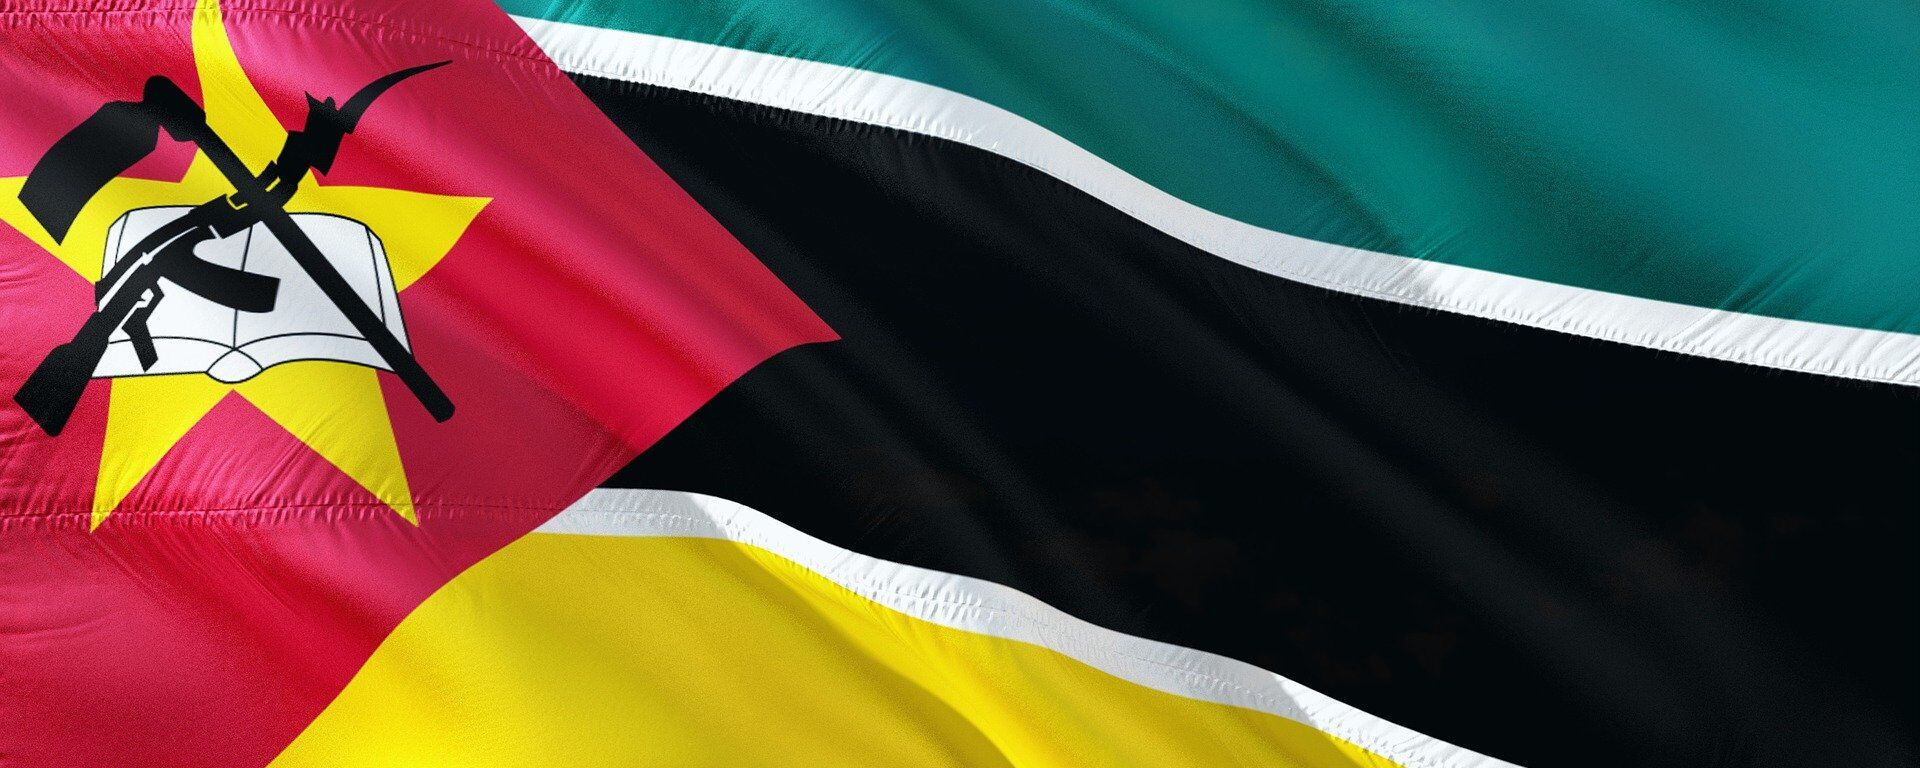 La bandera de Mozambique - Sputnik Mundo, 1920, 02.03.2021